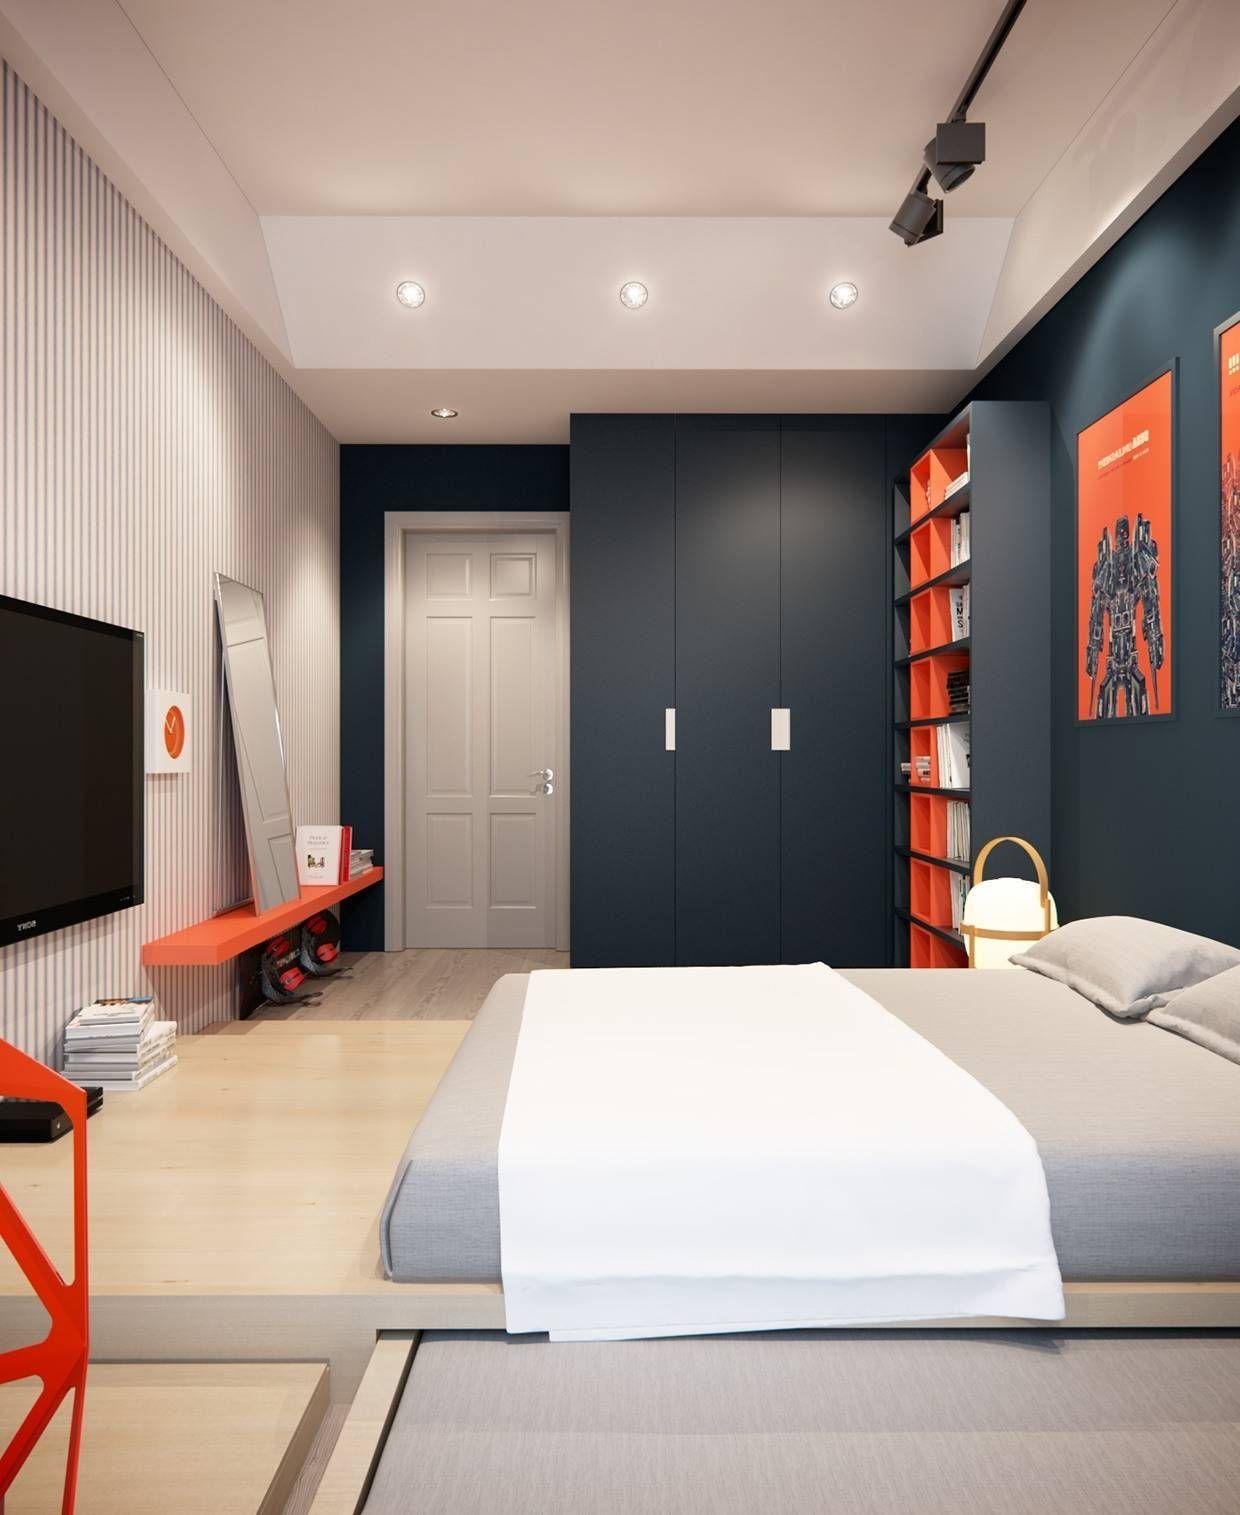 20 Cool Boys Bedroom Ideas To Try At Home Boy Bedroom Design Bedroom Interior Modern Bedroom